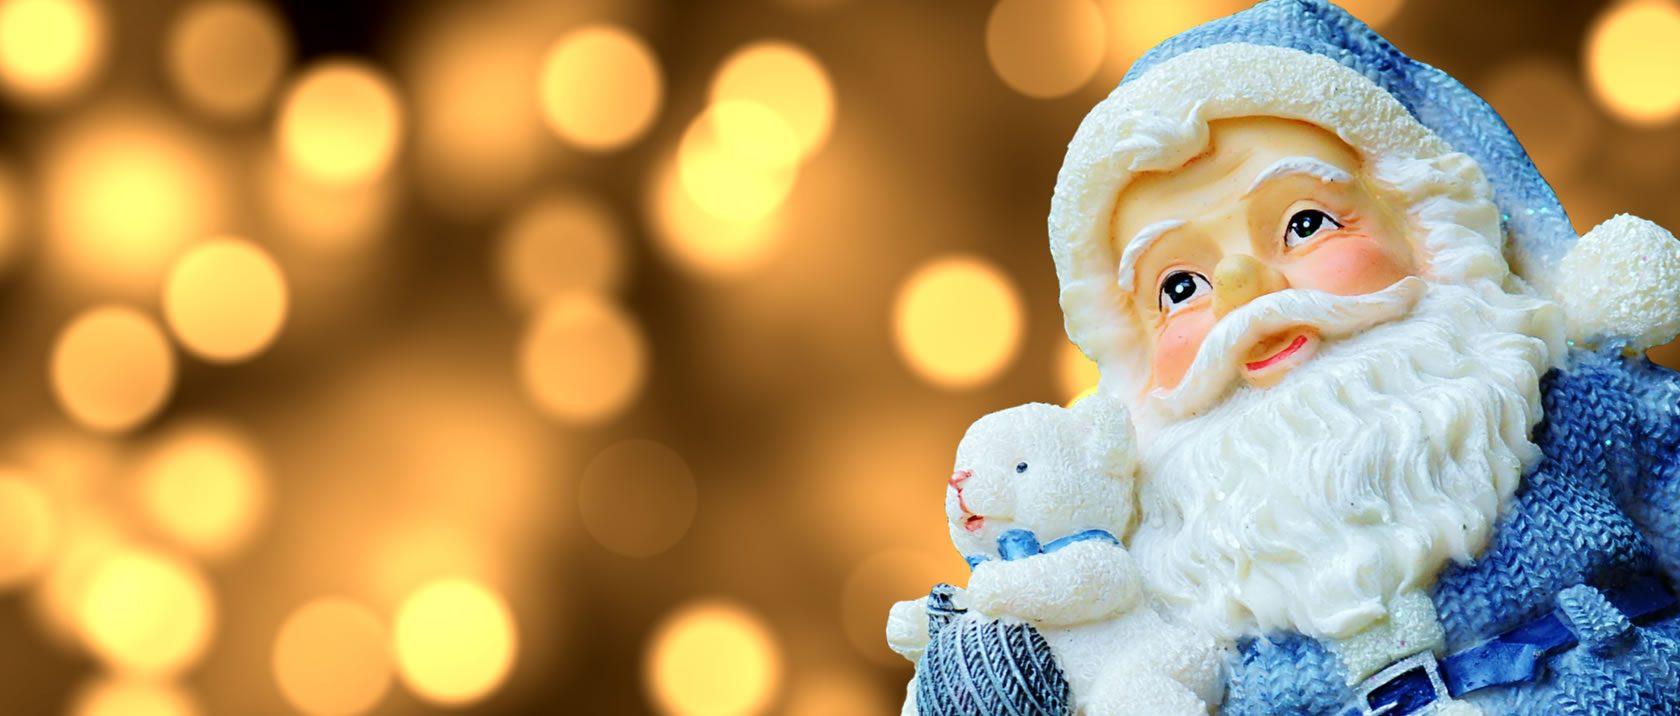 father christmas web design